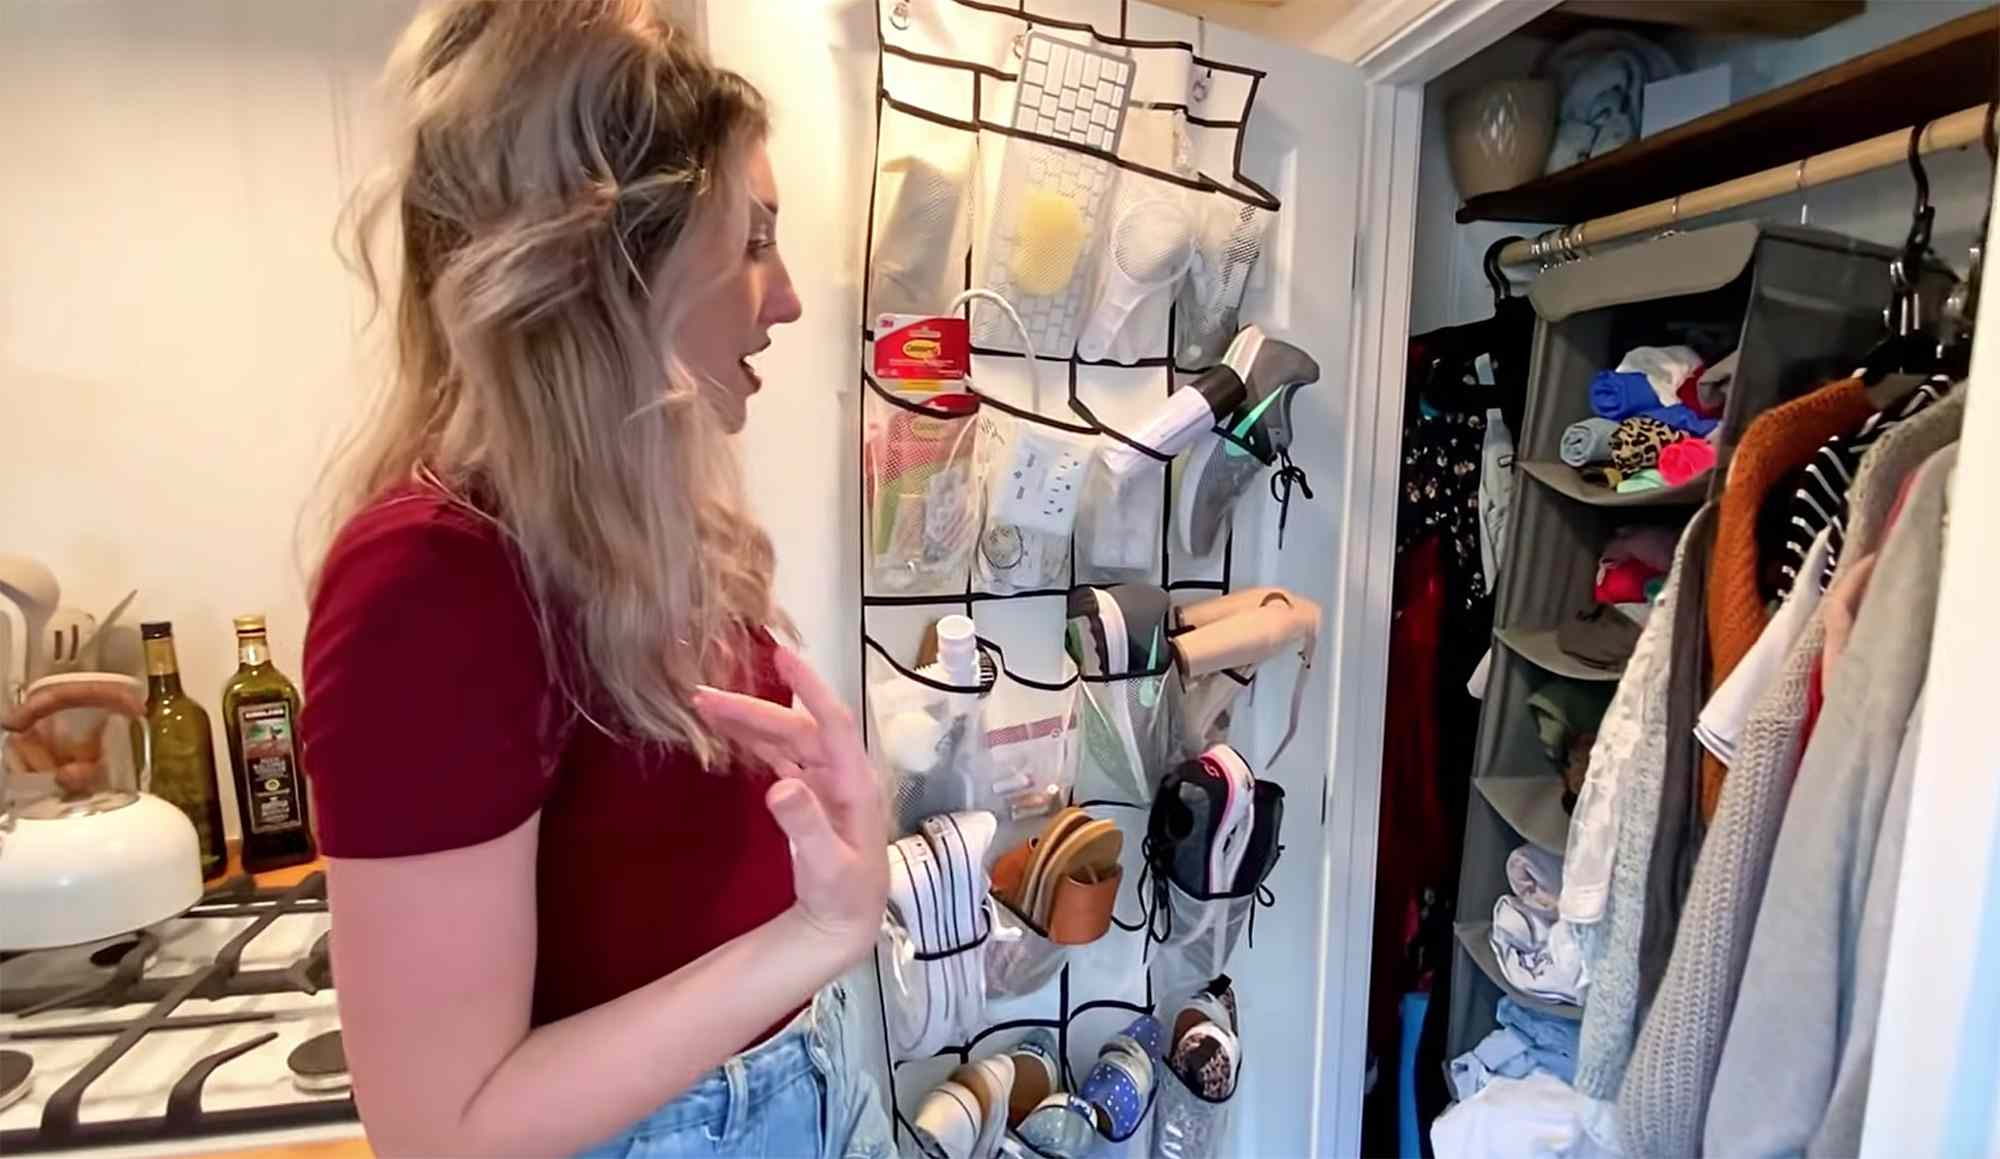 tiny house Rebekah teenytiny7 closet